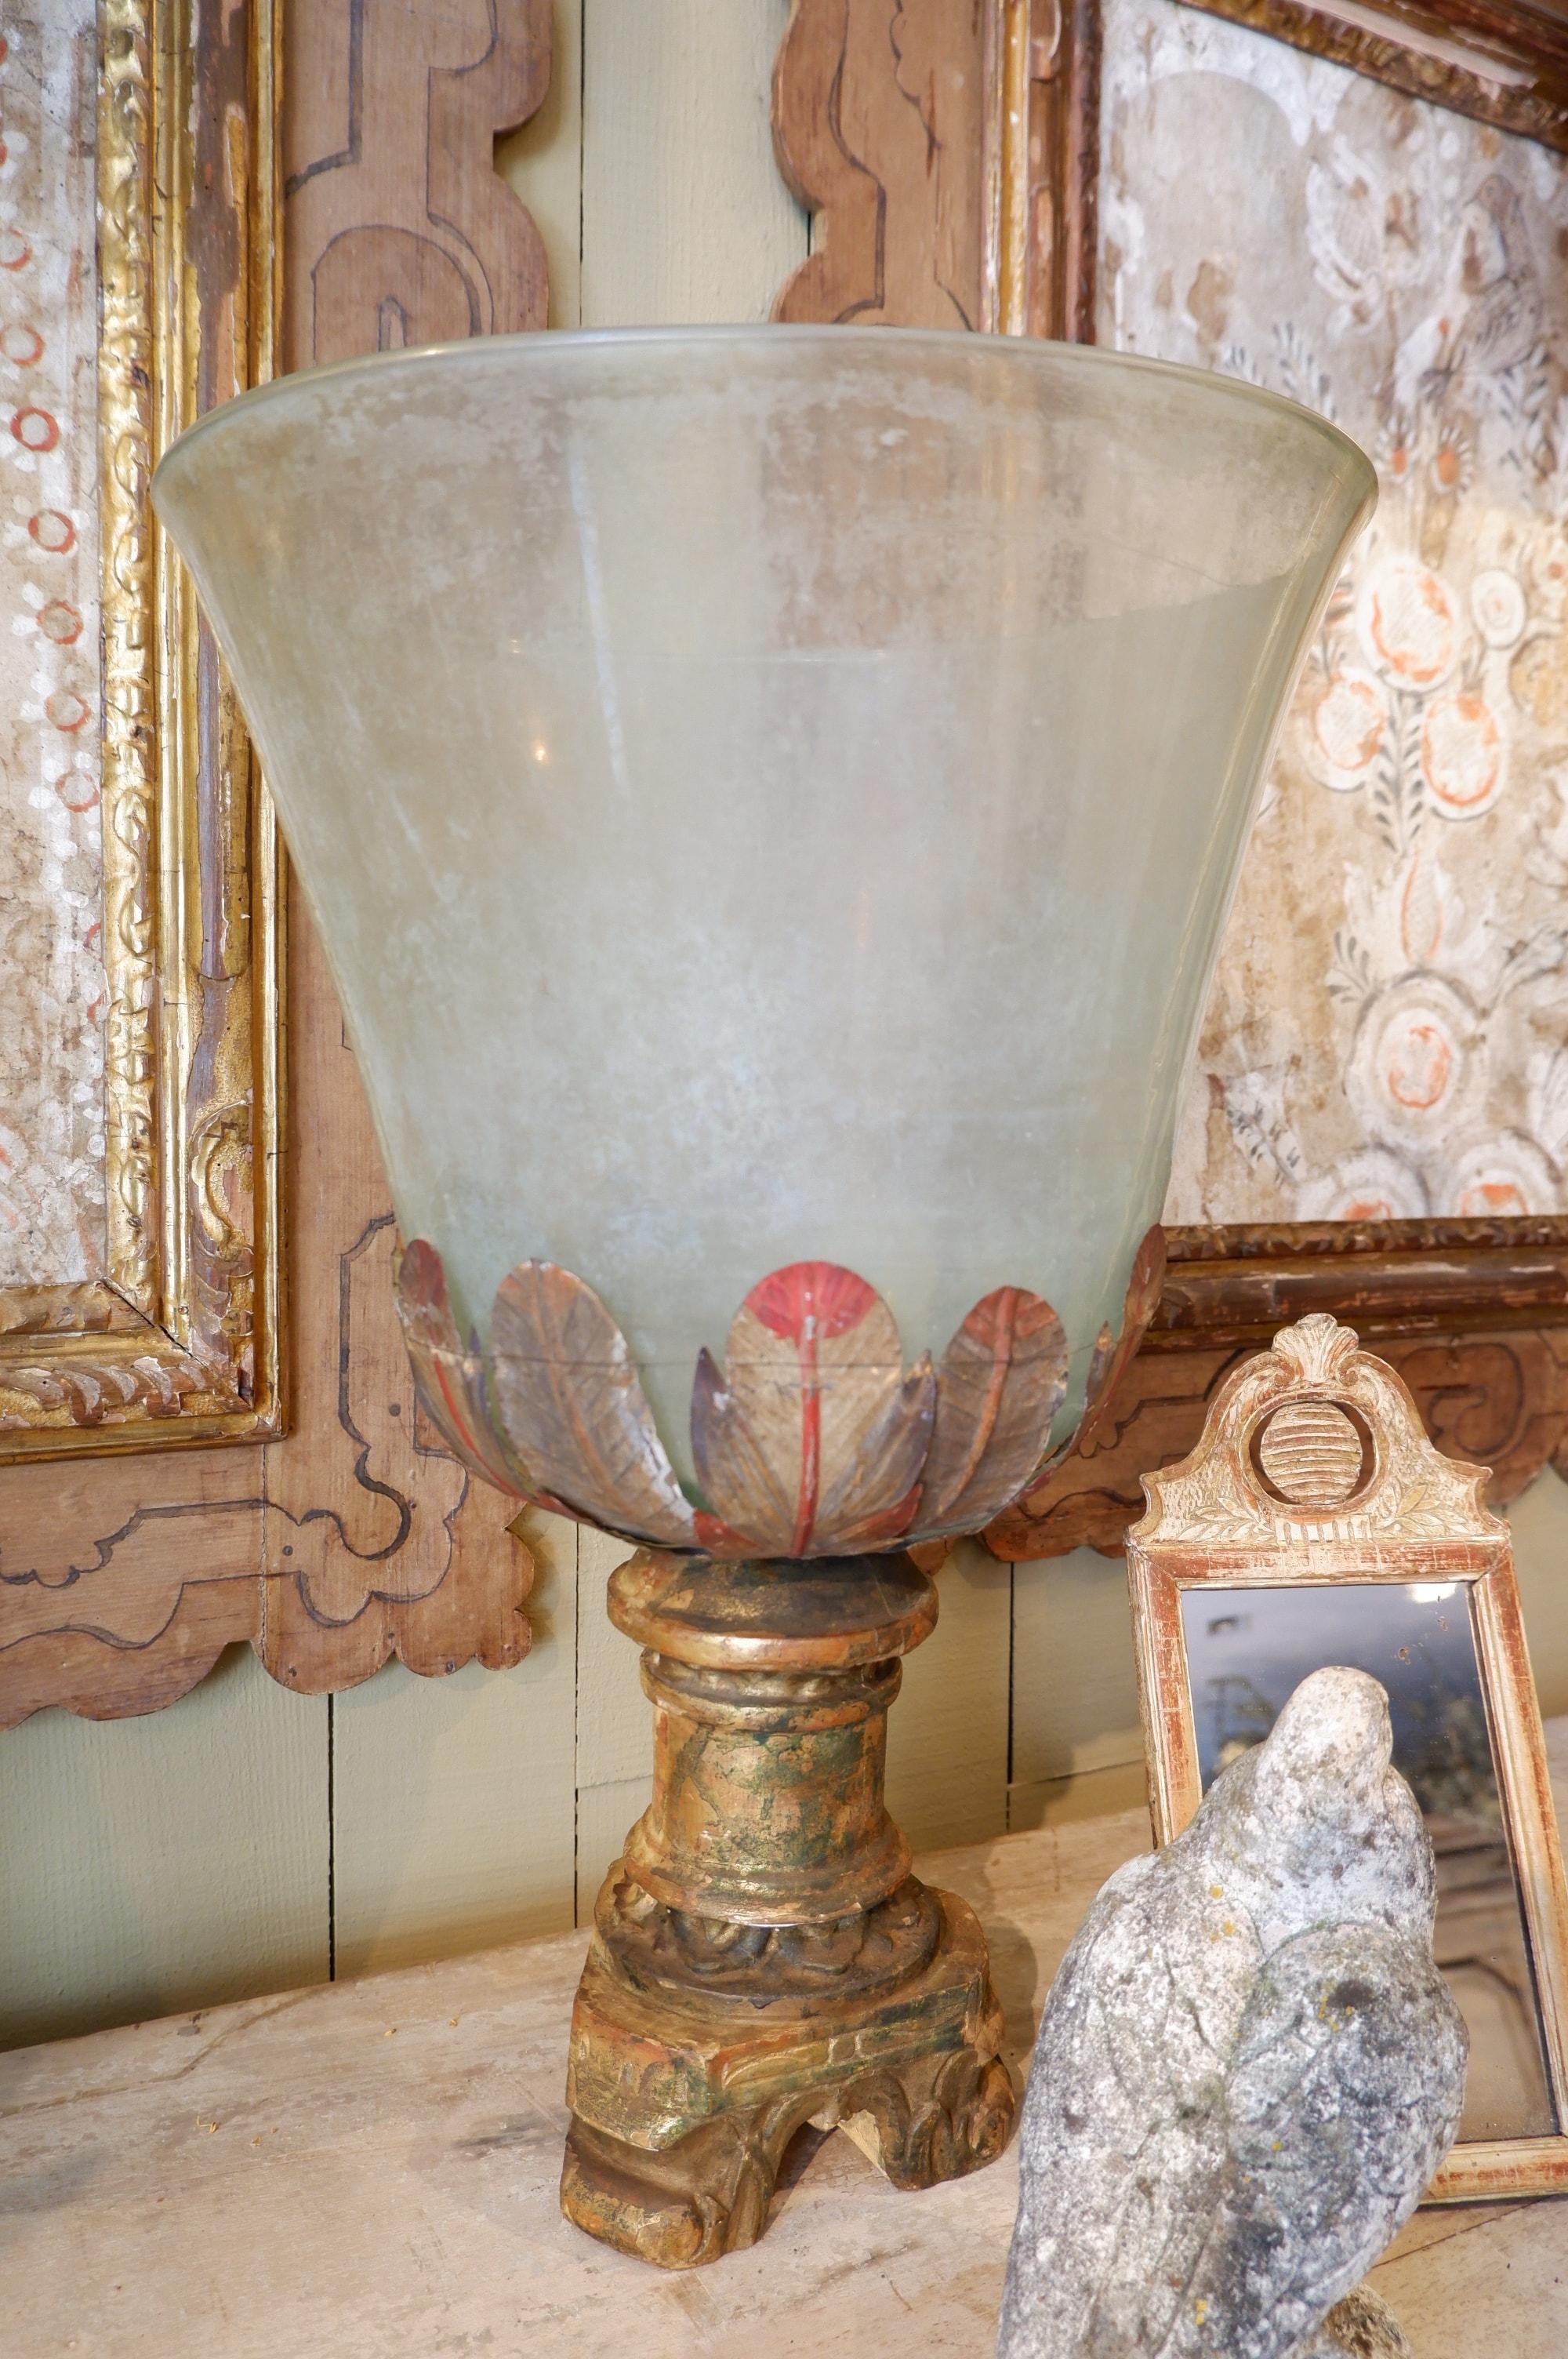 Grand photophore en verre XVIIIE socle en bois